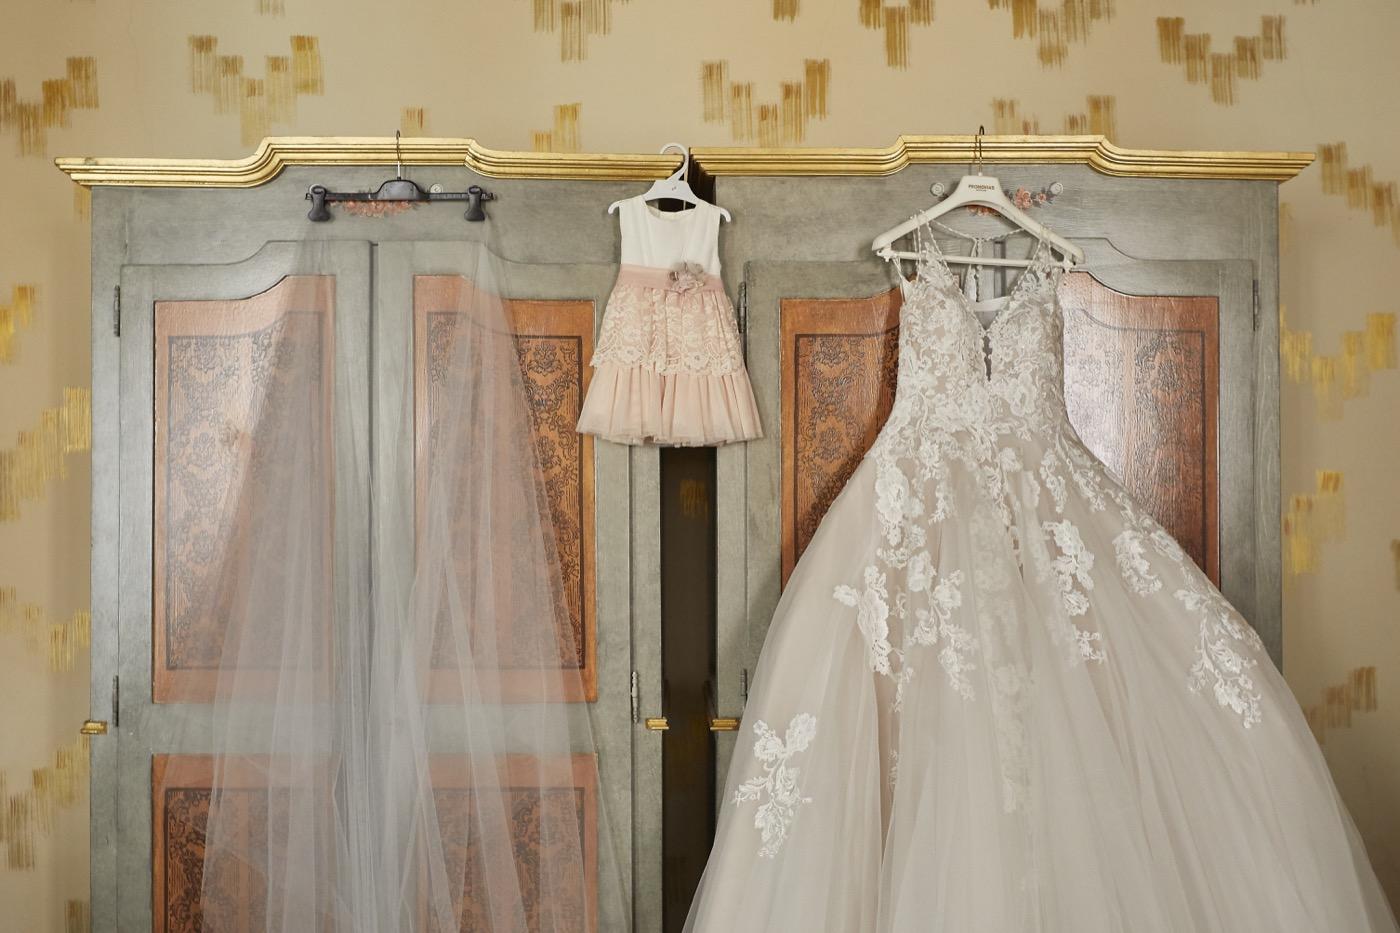 Claudio-Coppola-wedding-photographer-la-scuderia-eventi-preparativi-la-rosetta-perugia-15